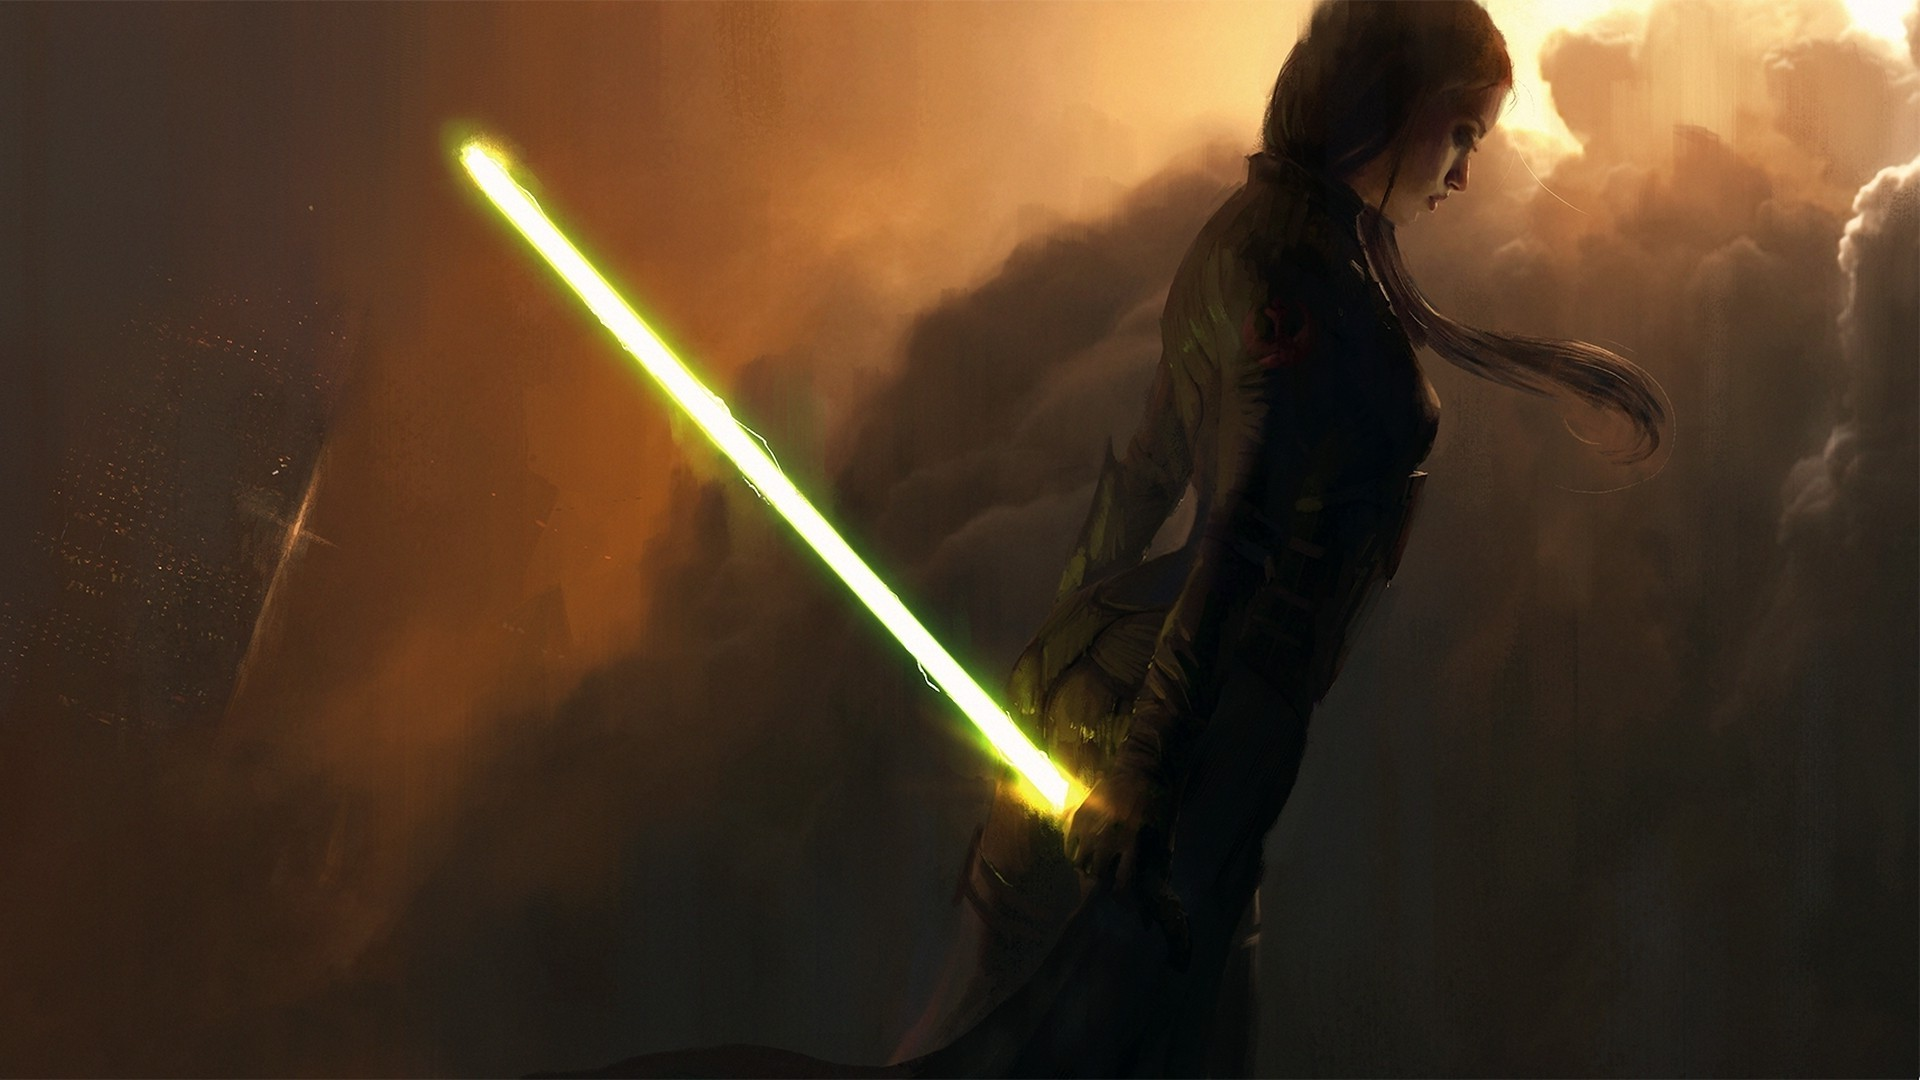 Female Jedi Yellow Lightsaber   1920x1080   Download HD Wallpaper 1920x1080